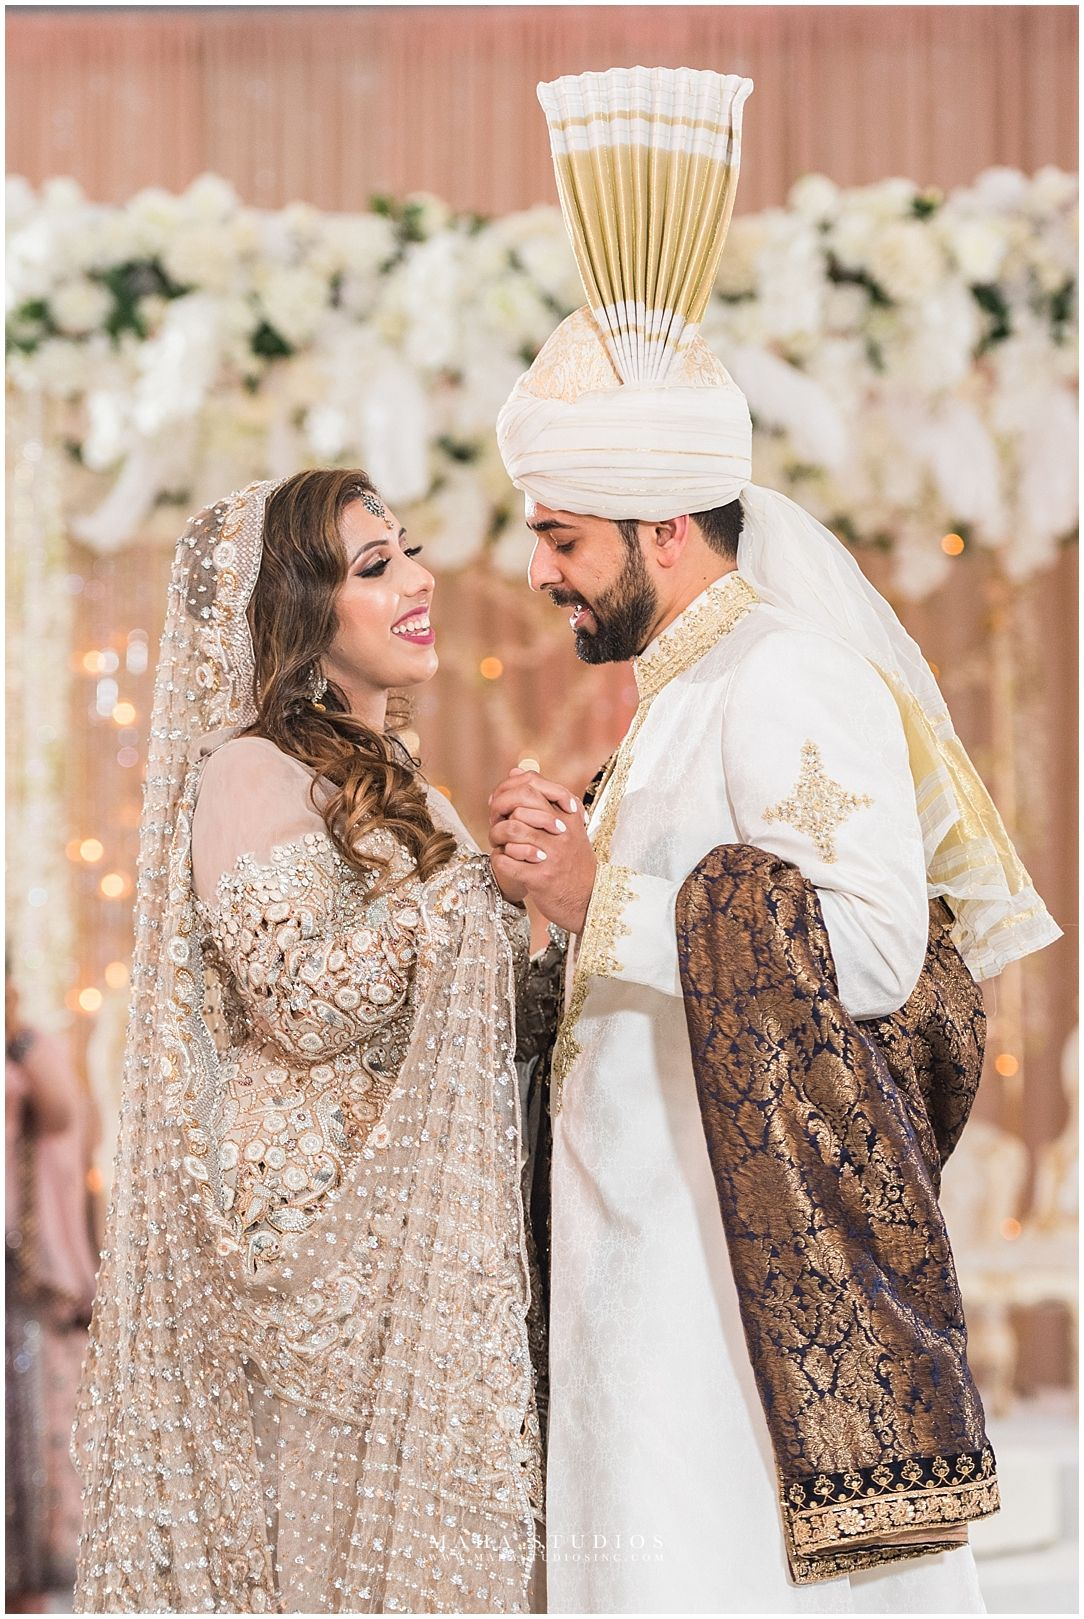 Sania Maskatiya Bridal Dress Chicago Bride Raddison Blu Aqua Hotel Pakistani Wedding Photography Pakistani Wedding Wedding Photography Los Angeles